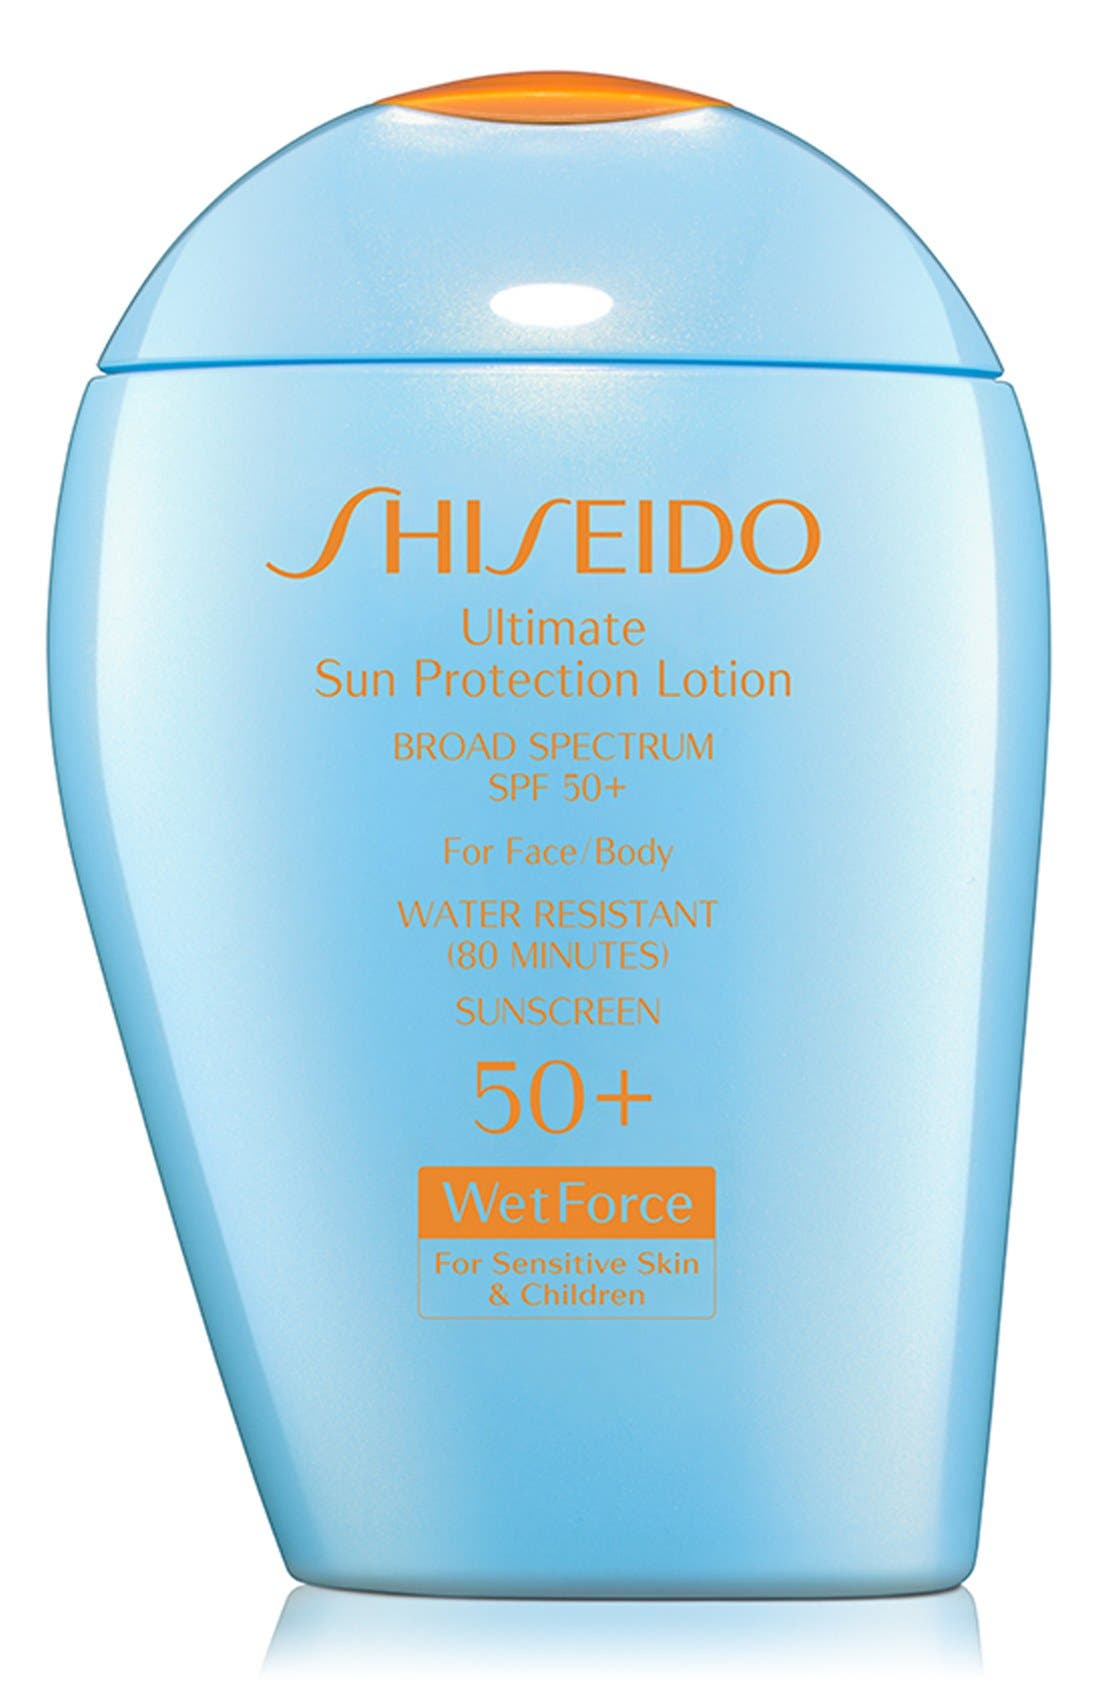 SHISEIDO Ultimate Sun Protection Lotion for Sensitive Skin & Children Broad Spectrum SPF 50+, Main, color, NO COLOR